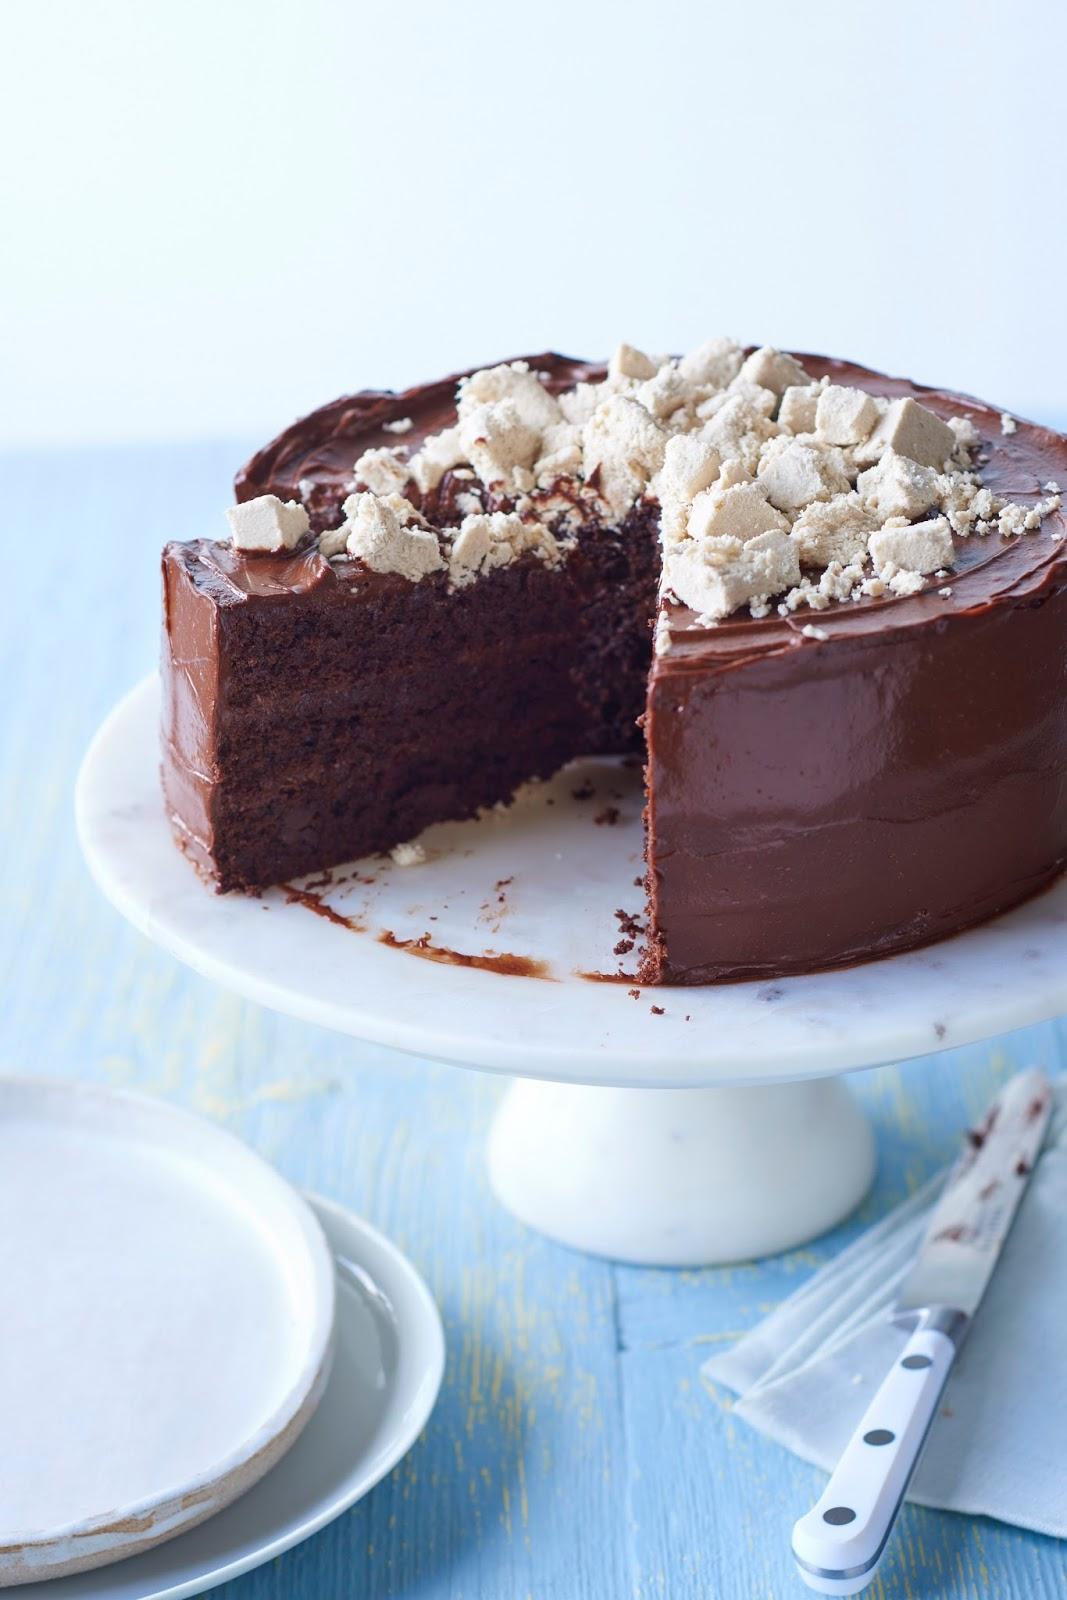 Lisa Roukin Grain-Free Chocolate Cake